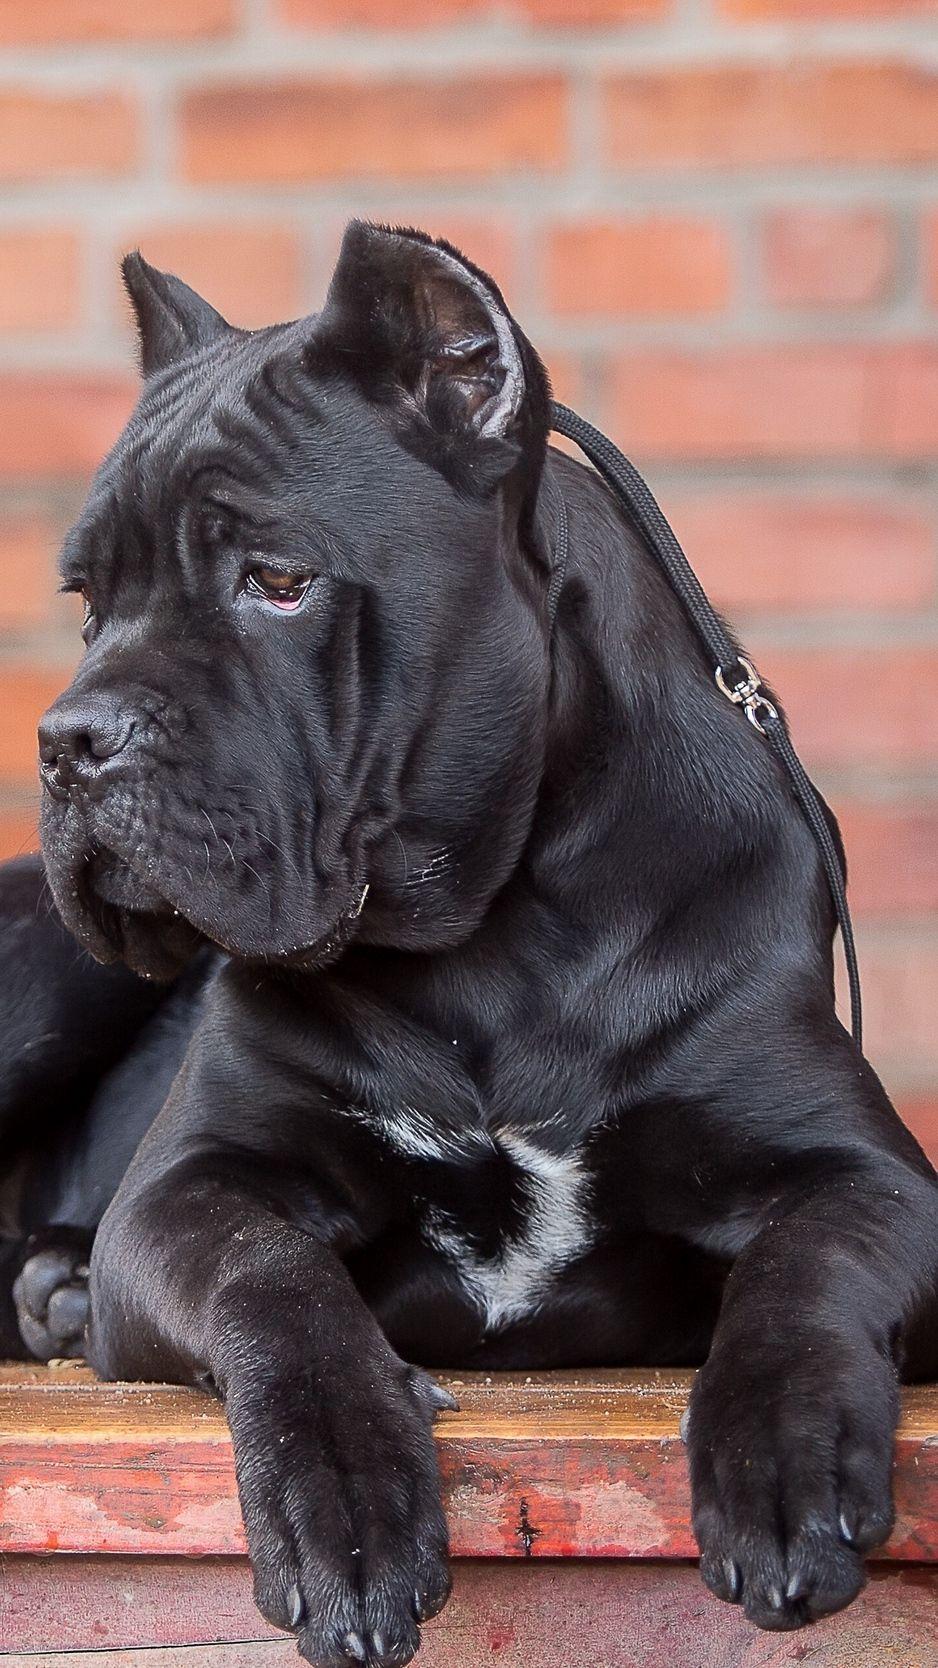 Cane Corso Dog Look Wallpaper Background Iphone Cane Corso Cane Corso Dog Corso Dog